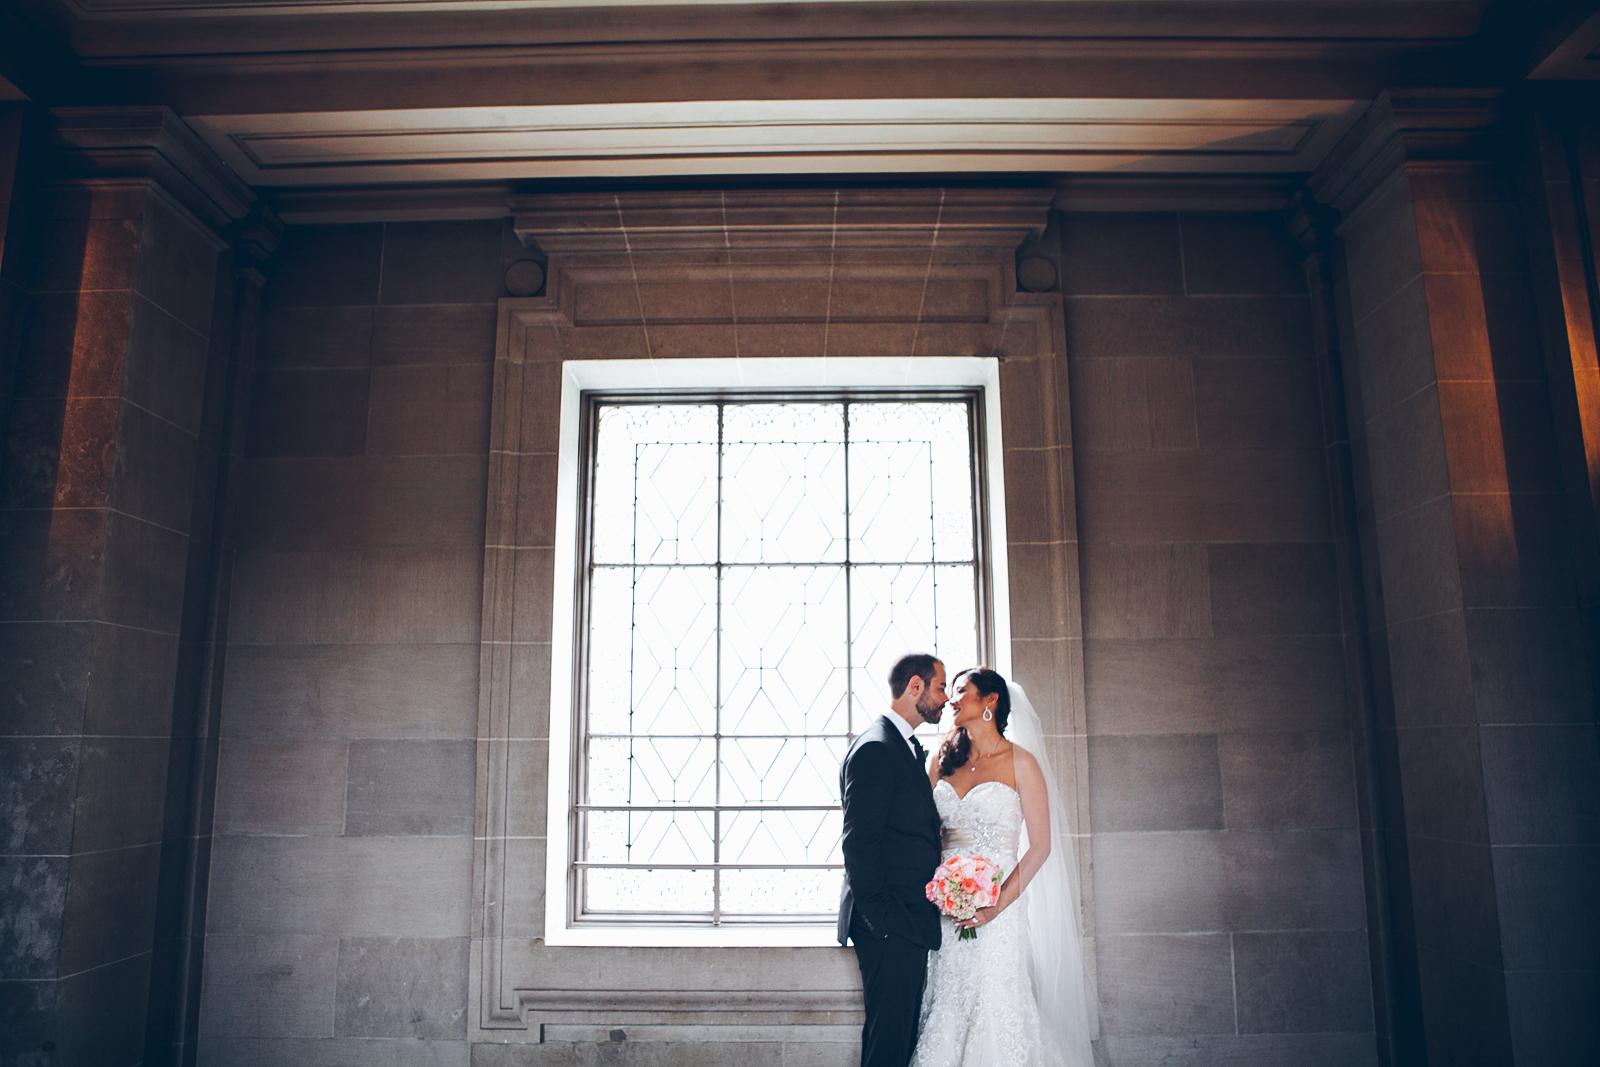 San_francisco_city_hall_wedding_photography_meegan_travis_ebony_siovhan_bokeh_photography_46.jpg